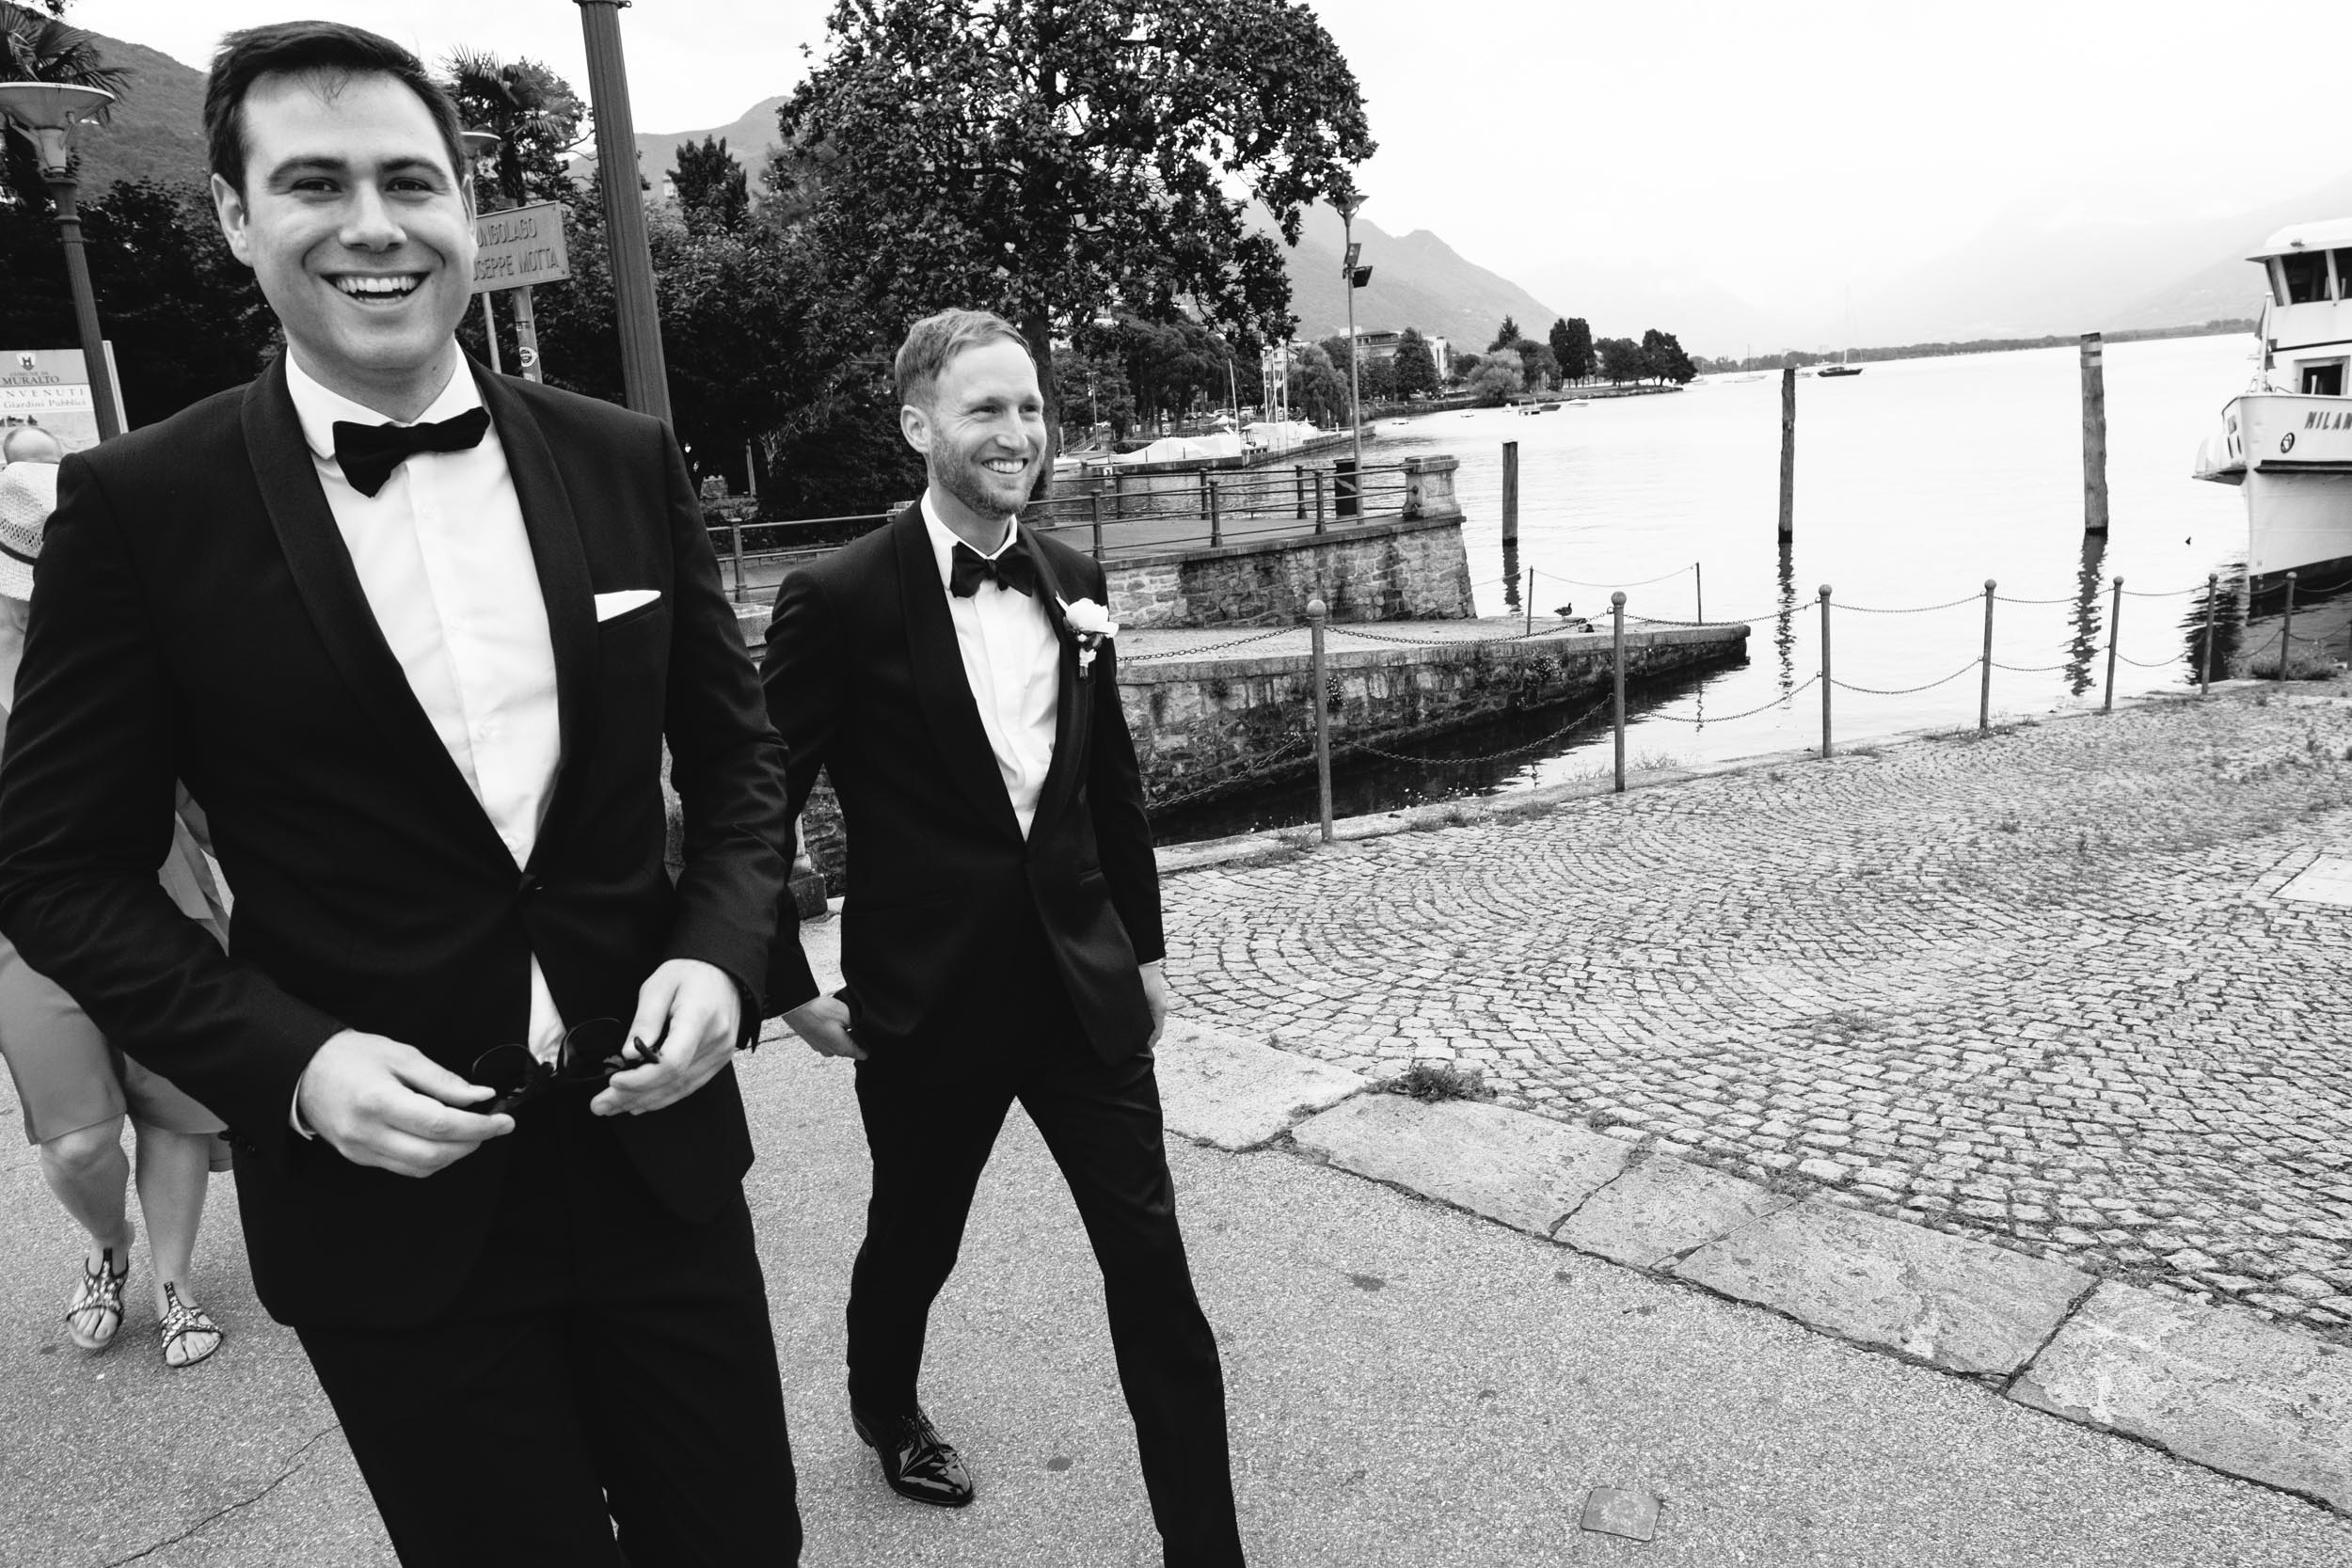 olivia-andreas-wedding-switzerland-157.jpg